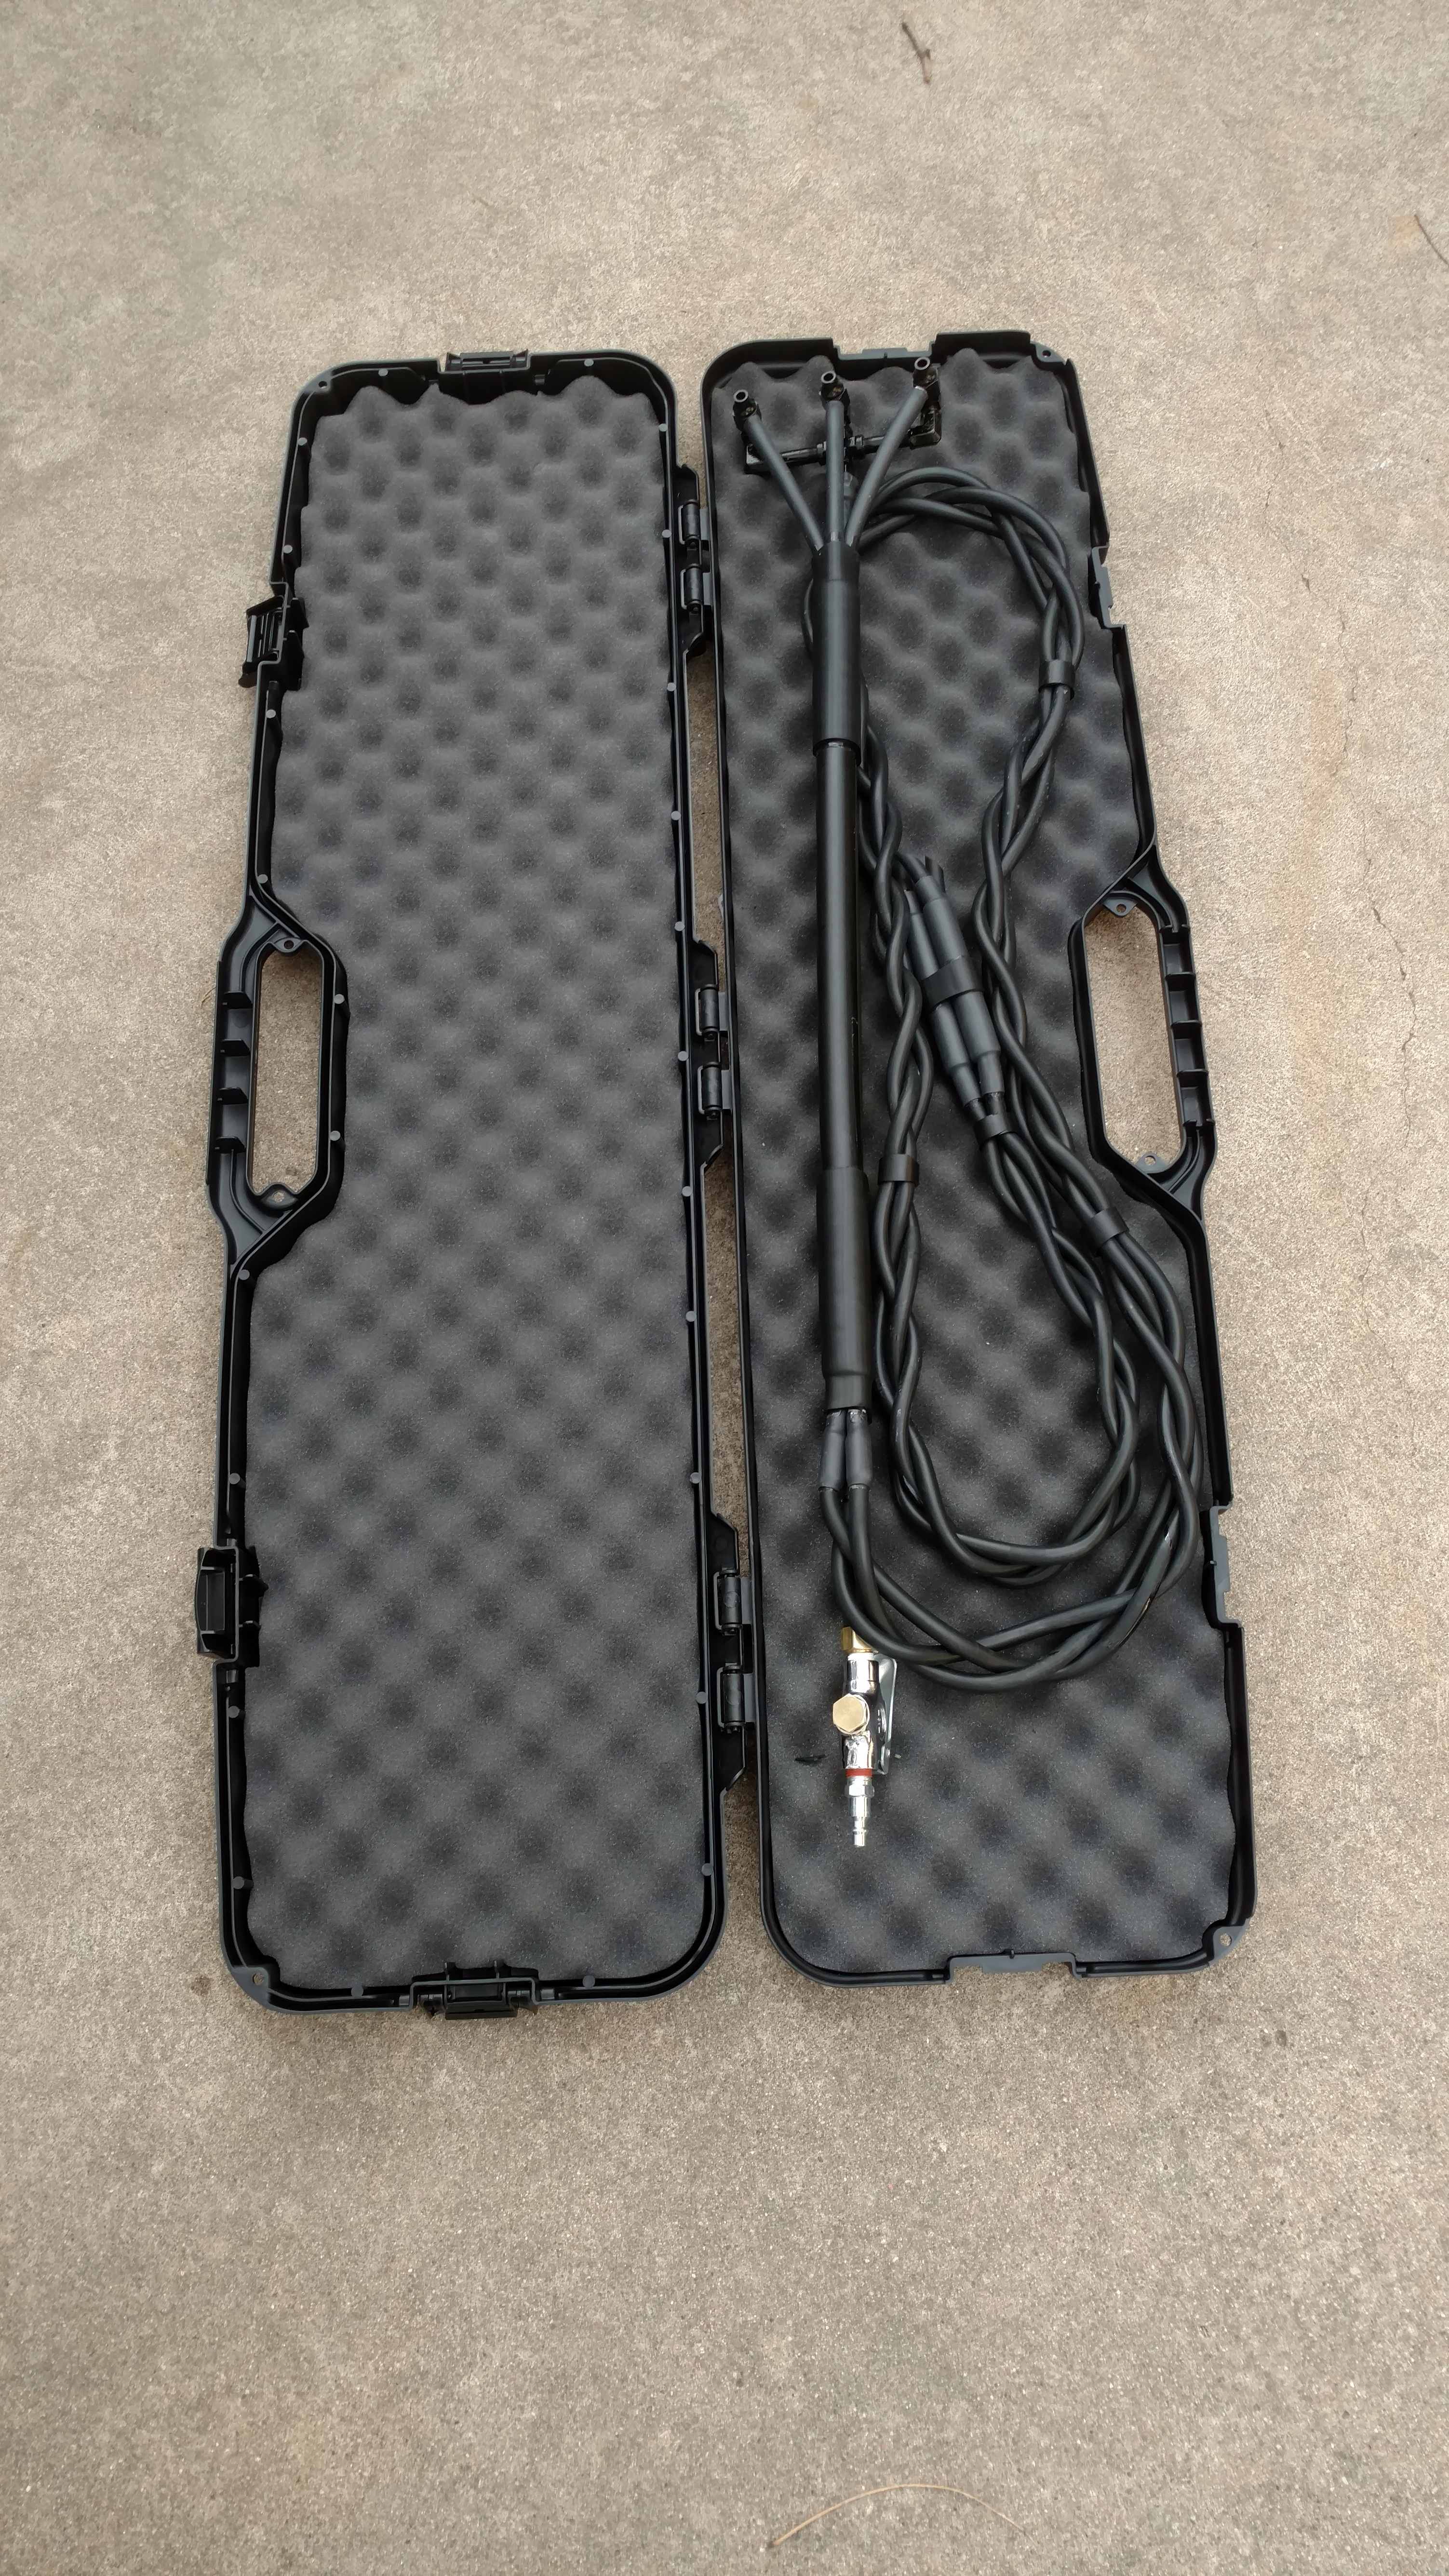 WW Triple Head Kit